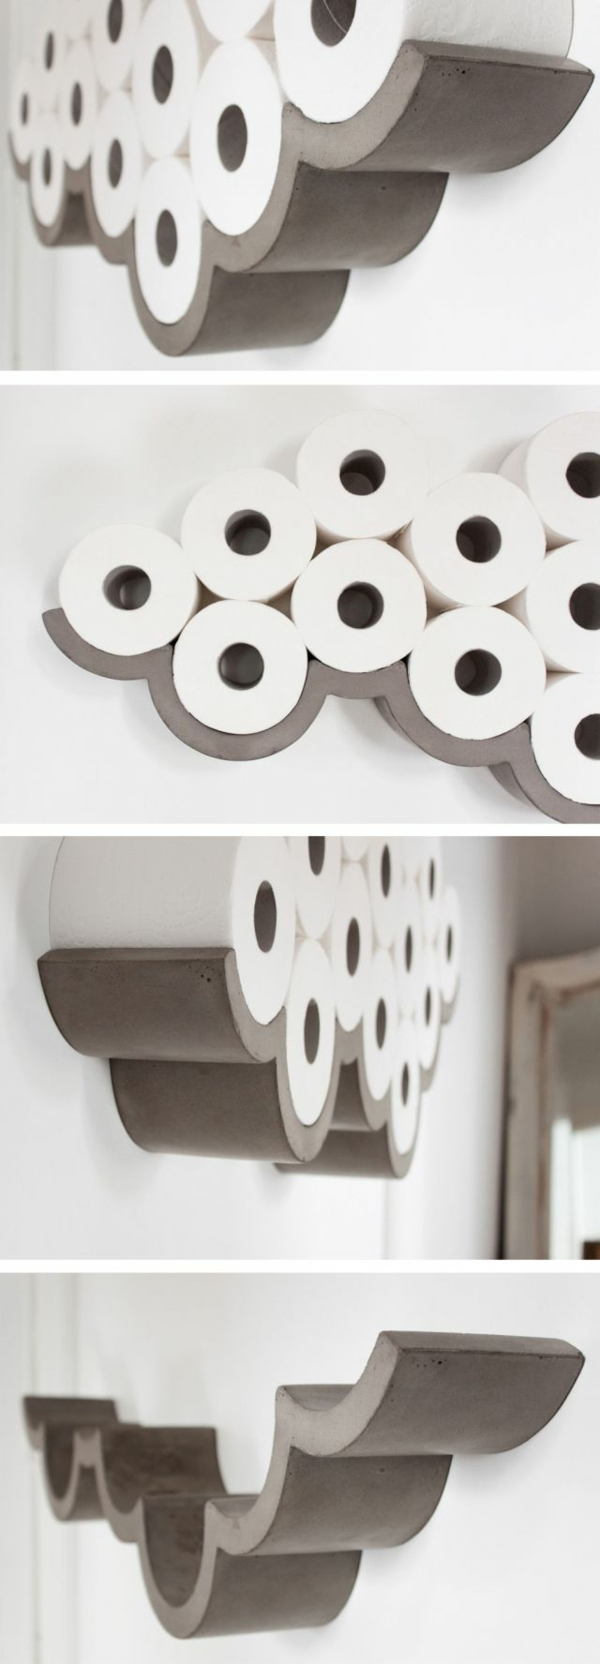 cleveres Produkt design design ideen toilettenpapier halter